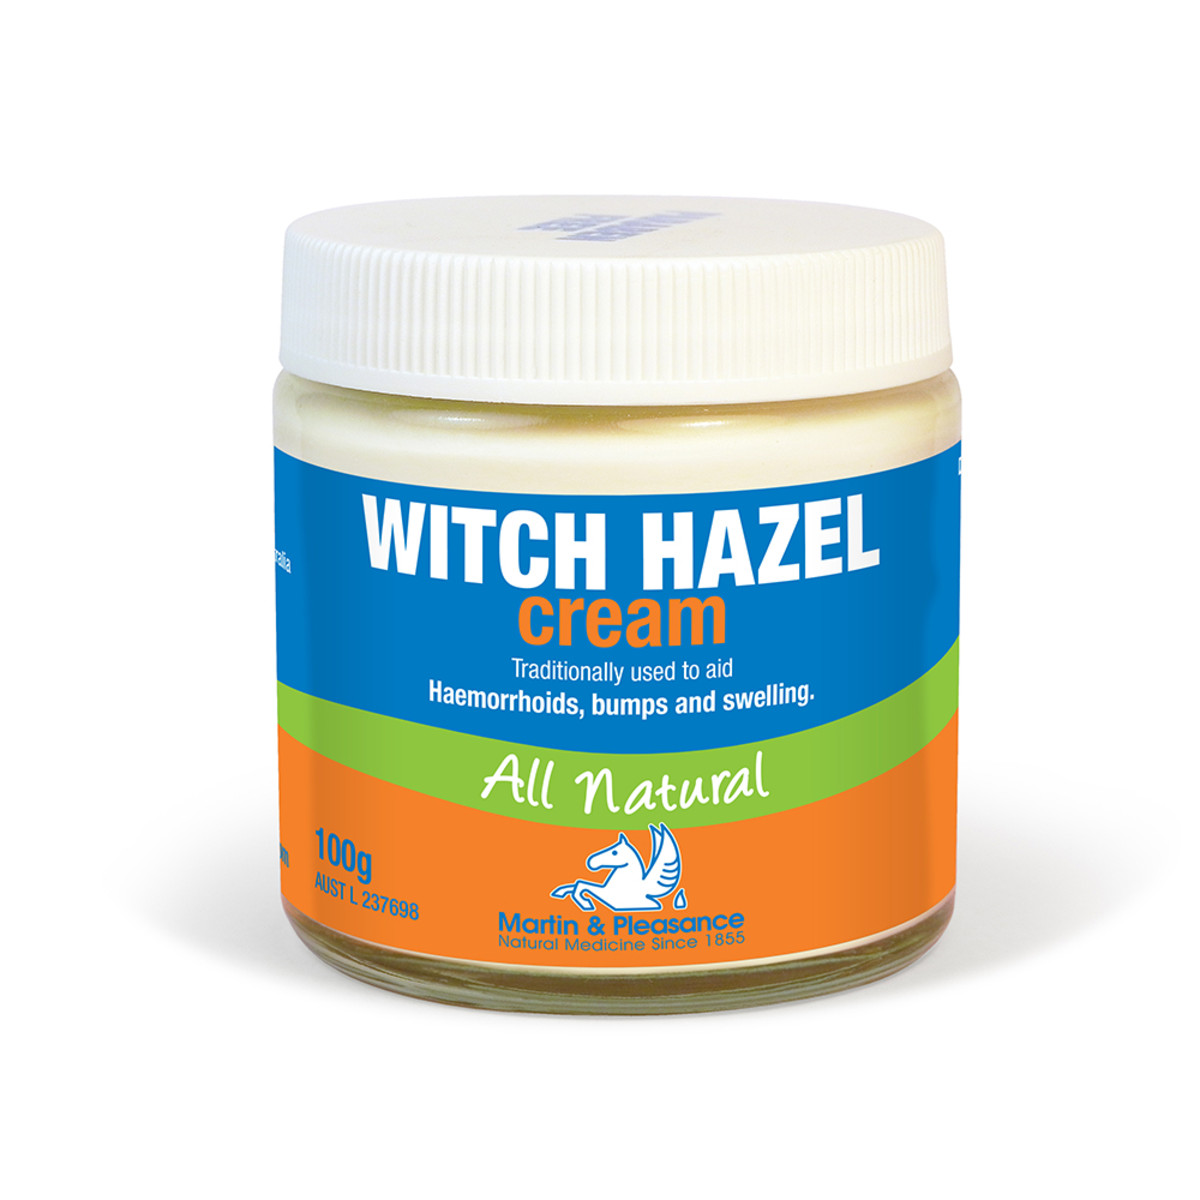 Image of Martin & Pleasance Hamamelis Witch Hazel Cream 100g for haemorrhoids r